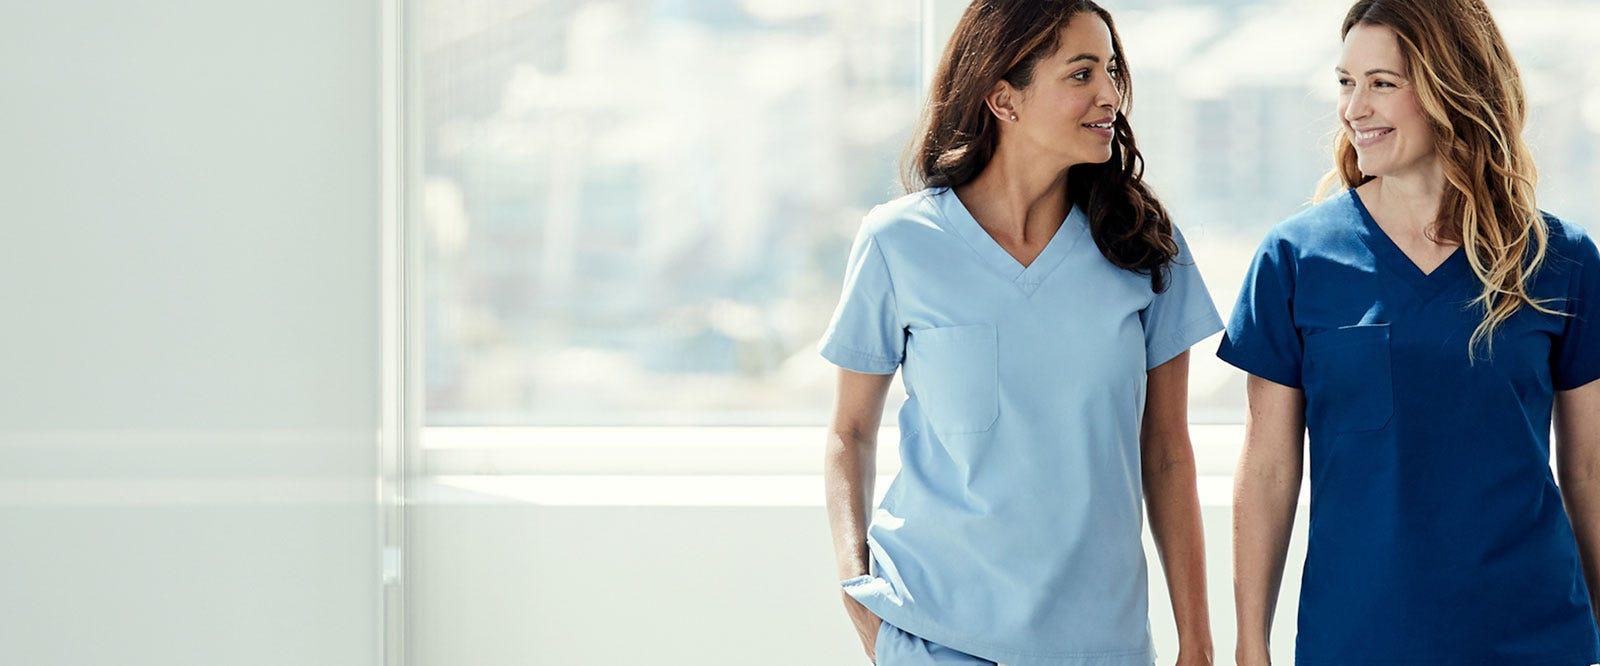 womens physician scrubs